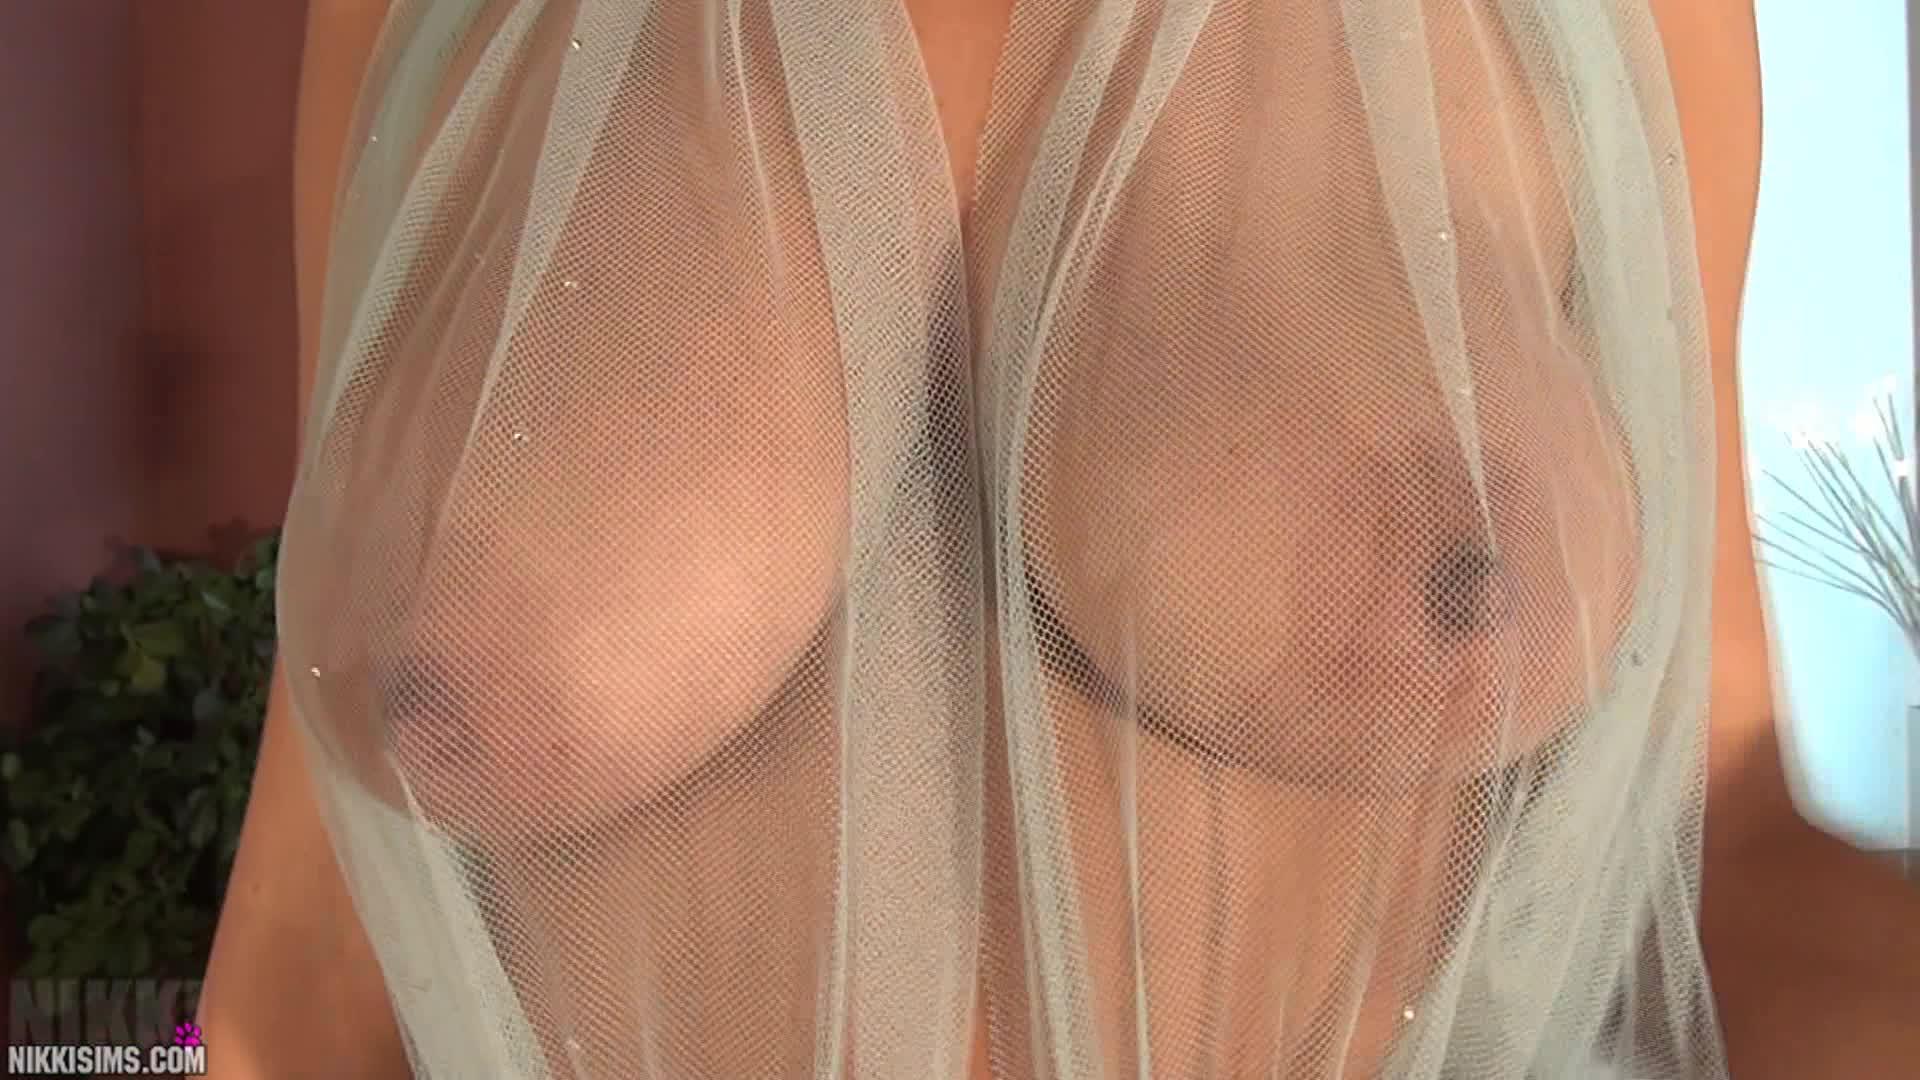 Yuri luv sheer top huge boobs